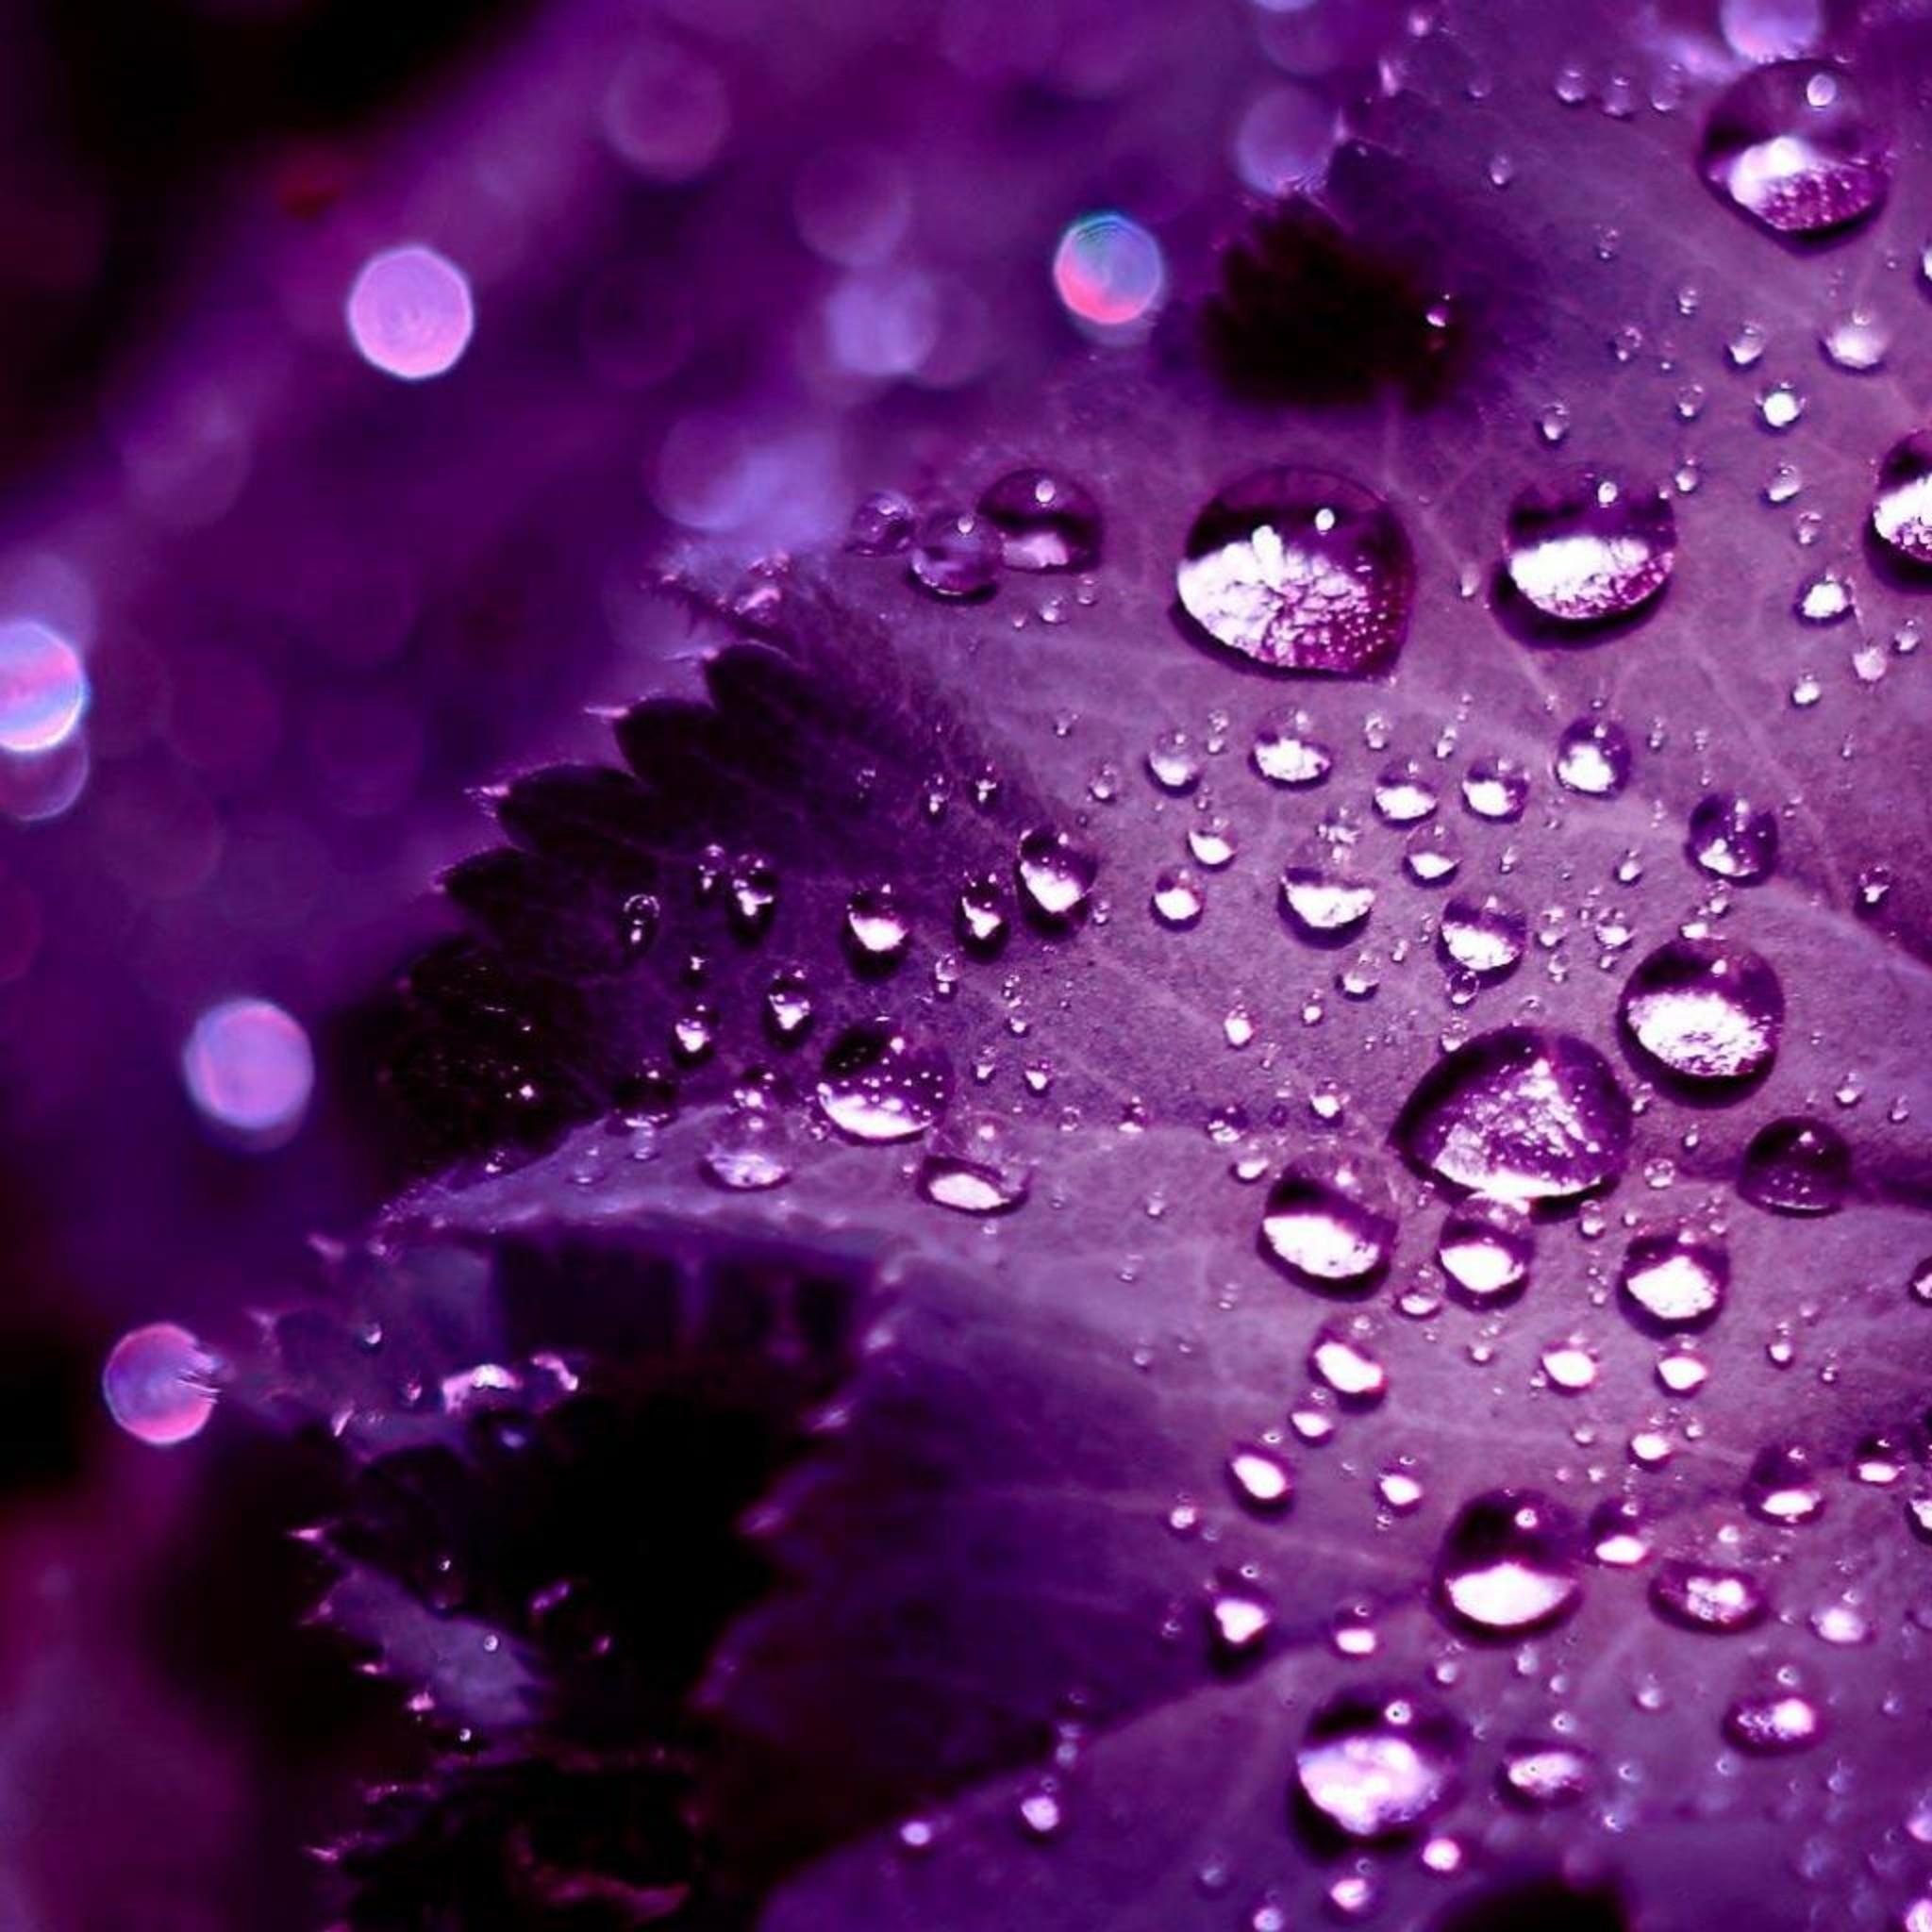 iPad Retina HD Wallpaper Purple Leaves – iPad, iPad Air, iPad Pro, ios 11,  iPhone 6, iPhone 7 Plus & Cydia Help